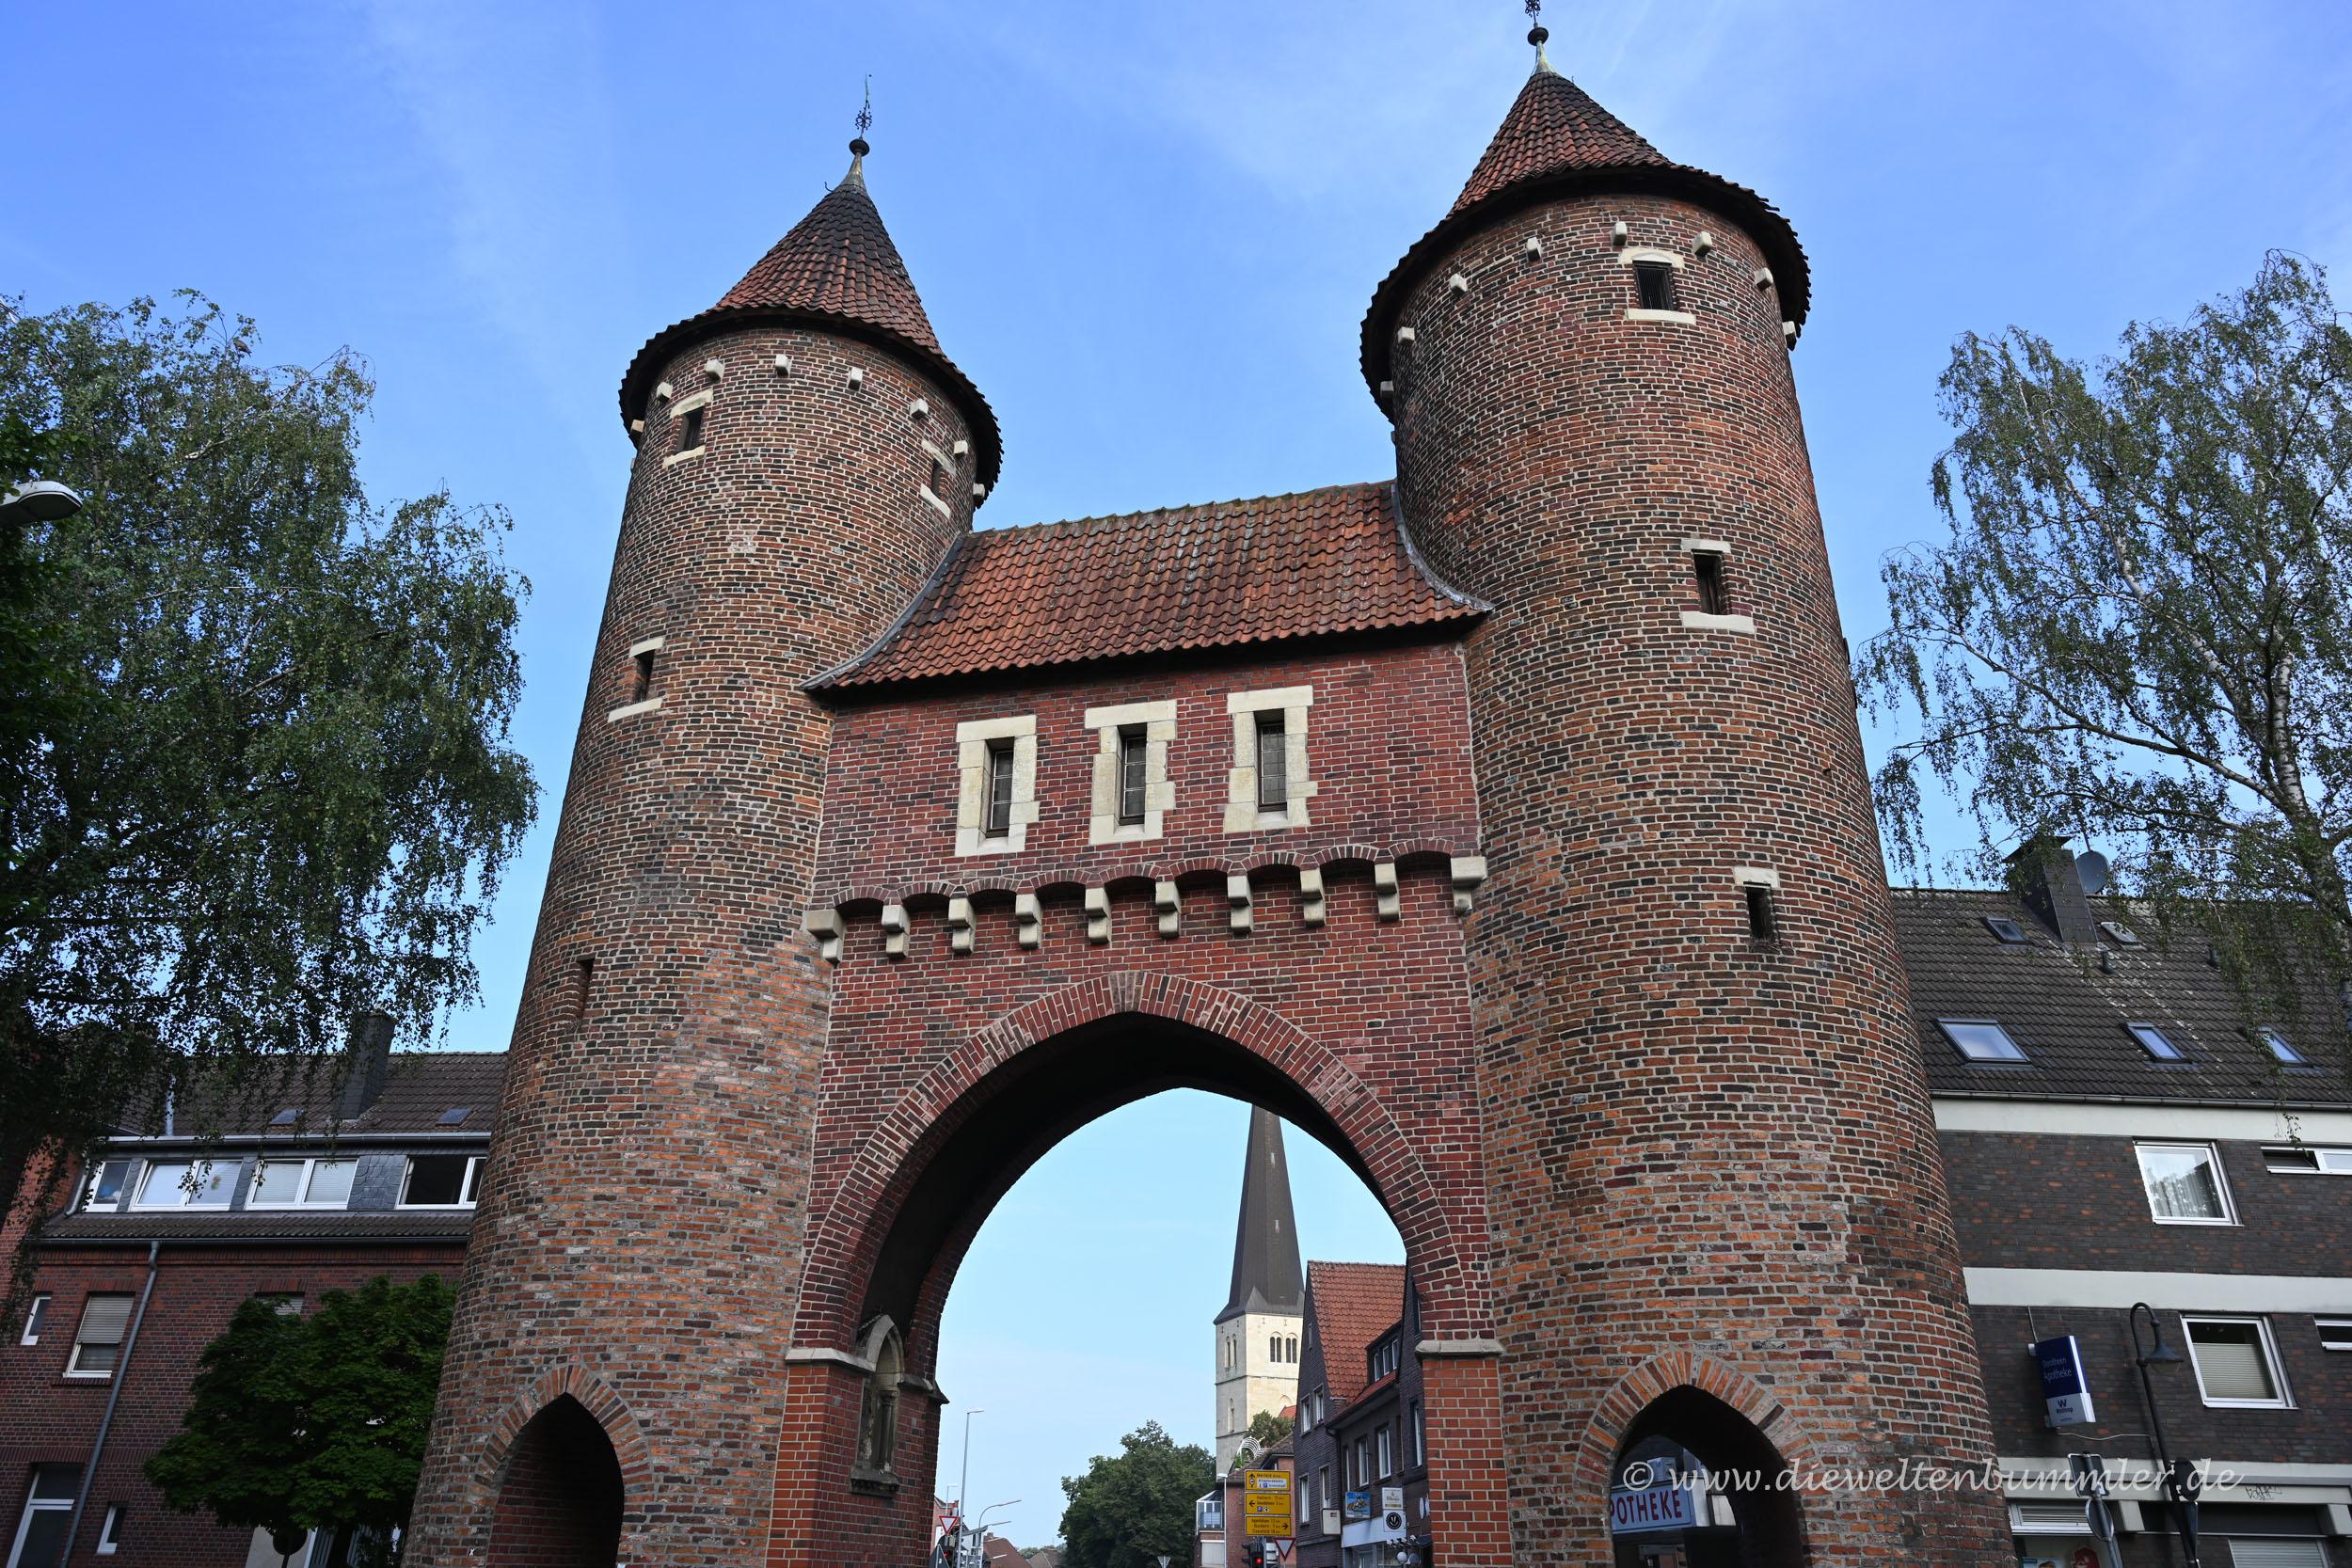 Lüdinghauser Tor in Dülmen